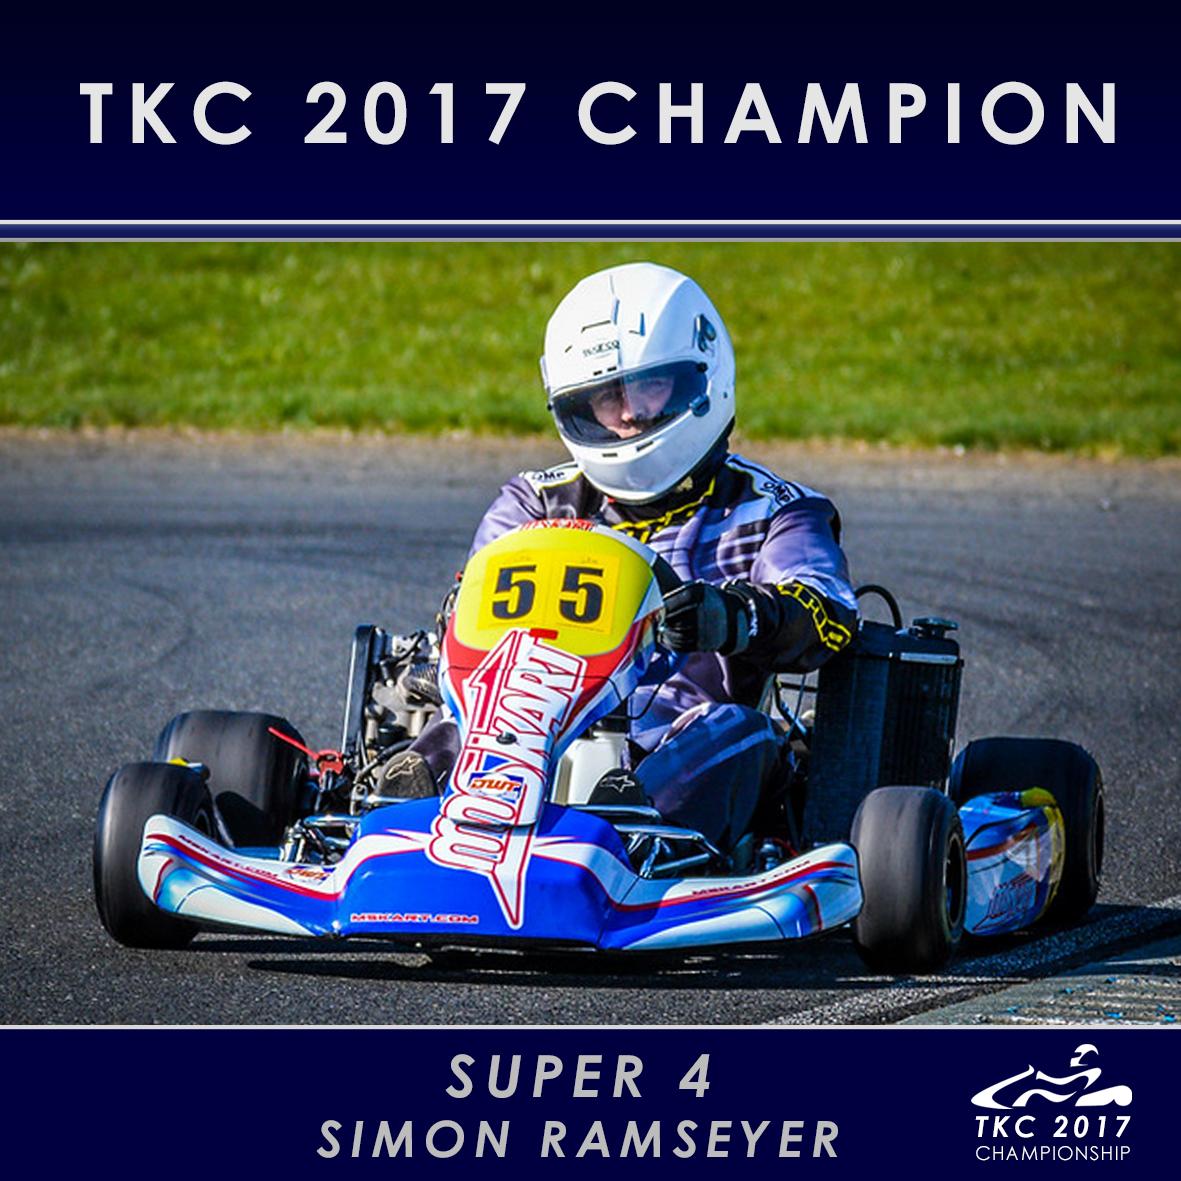 Super 4 - Simon Ramseyer